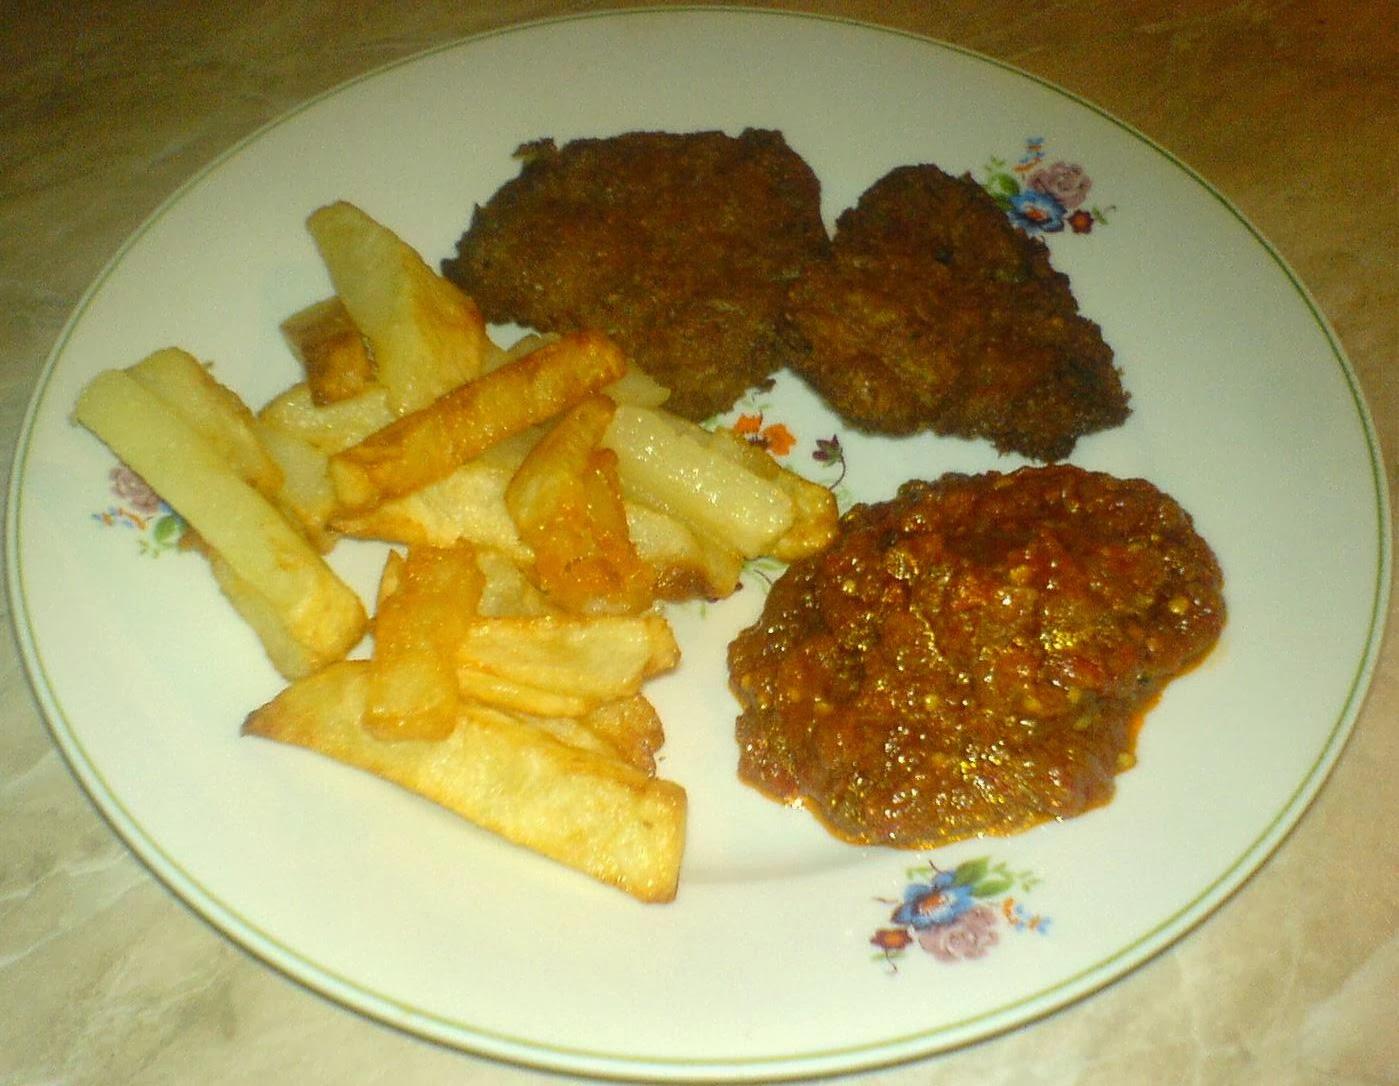 mancaruri de post, soia snitele cu cartofi prajiti si zacusca, retete culinare, retete de post, preparate din soia si cartofi,